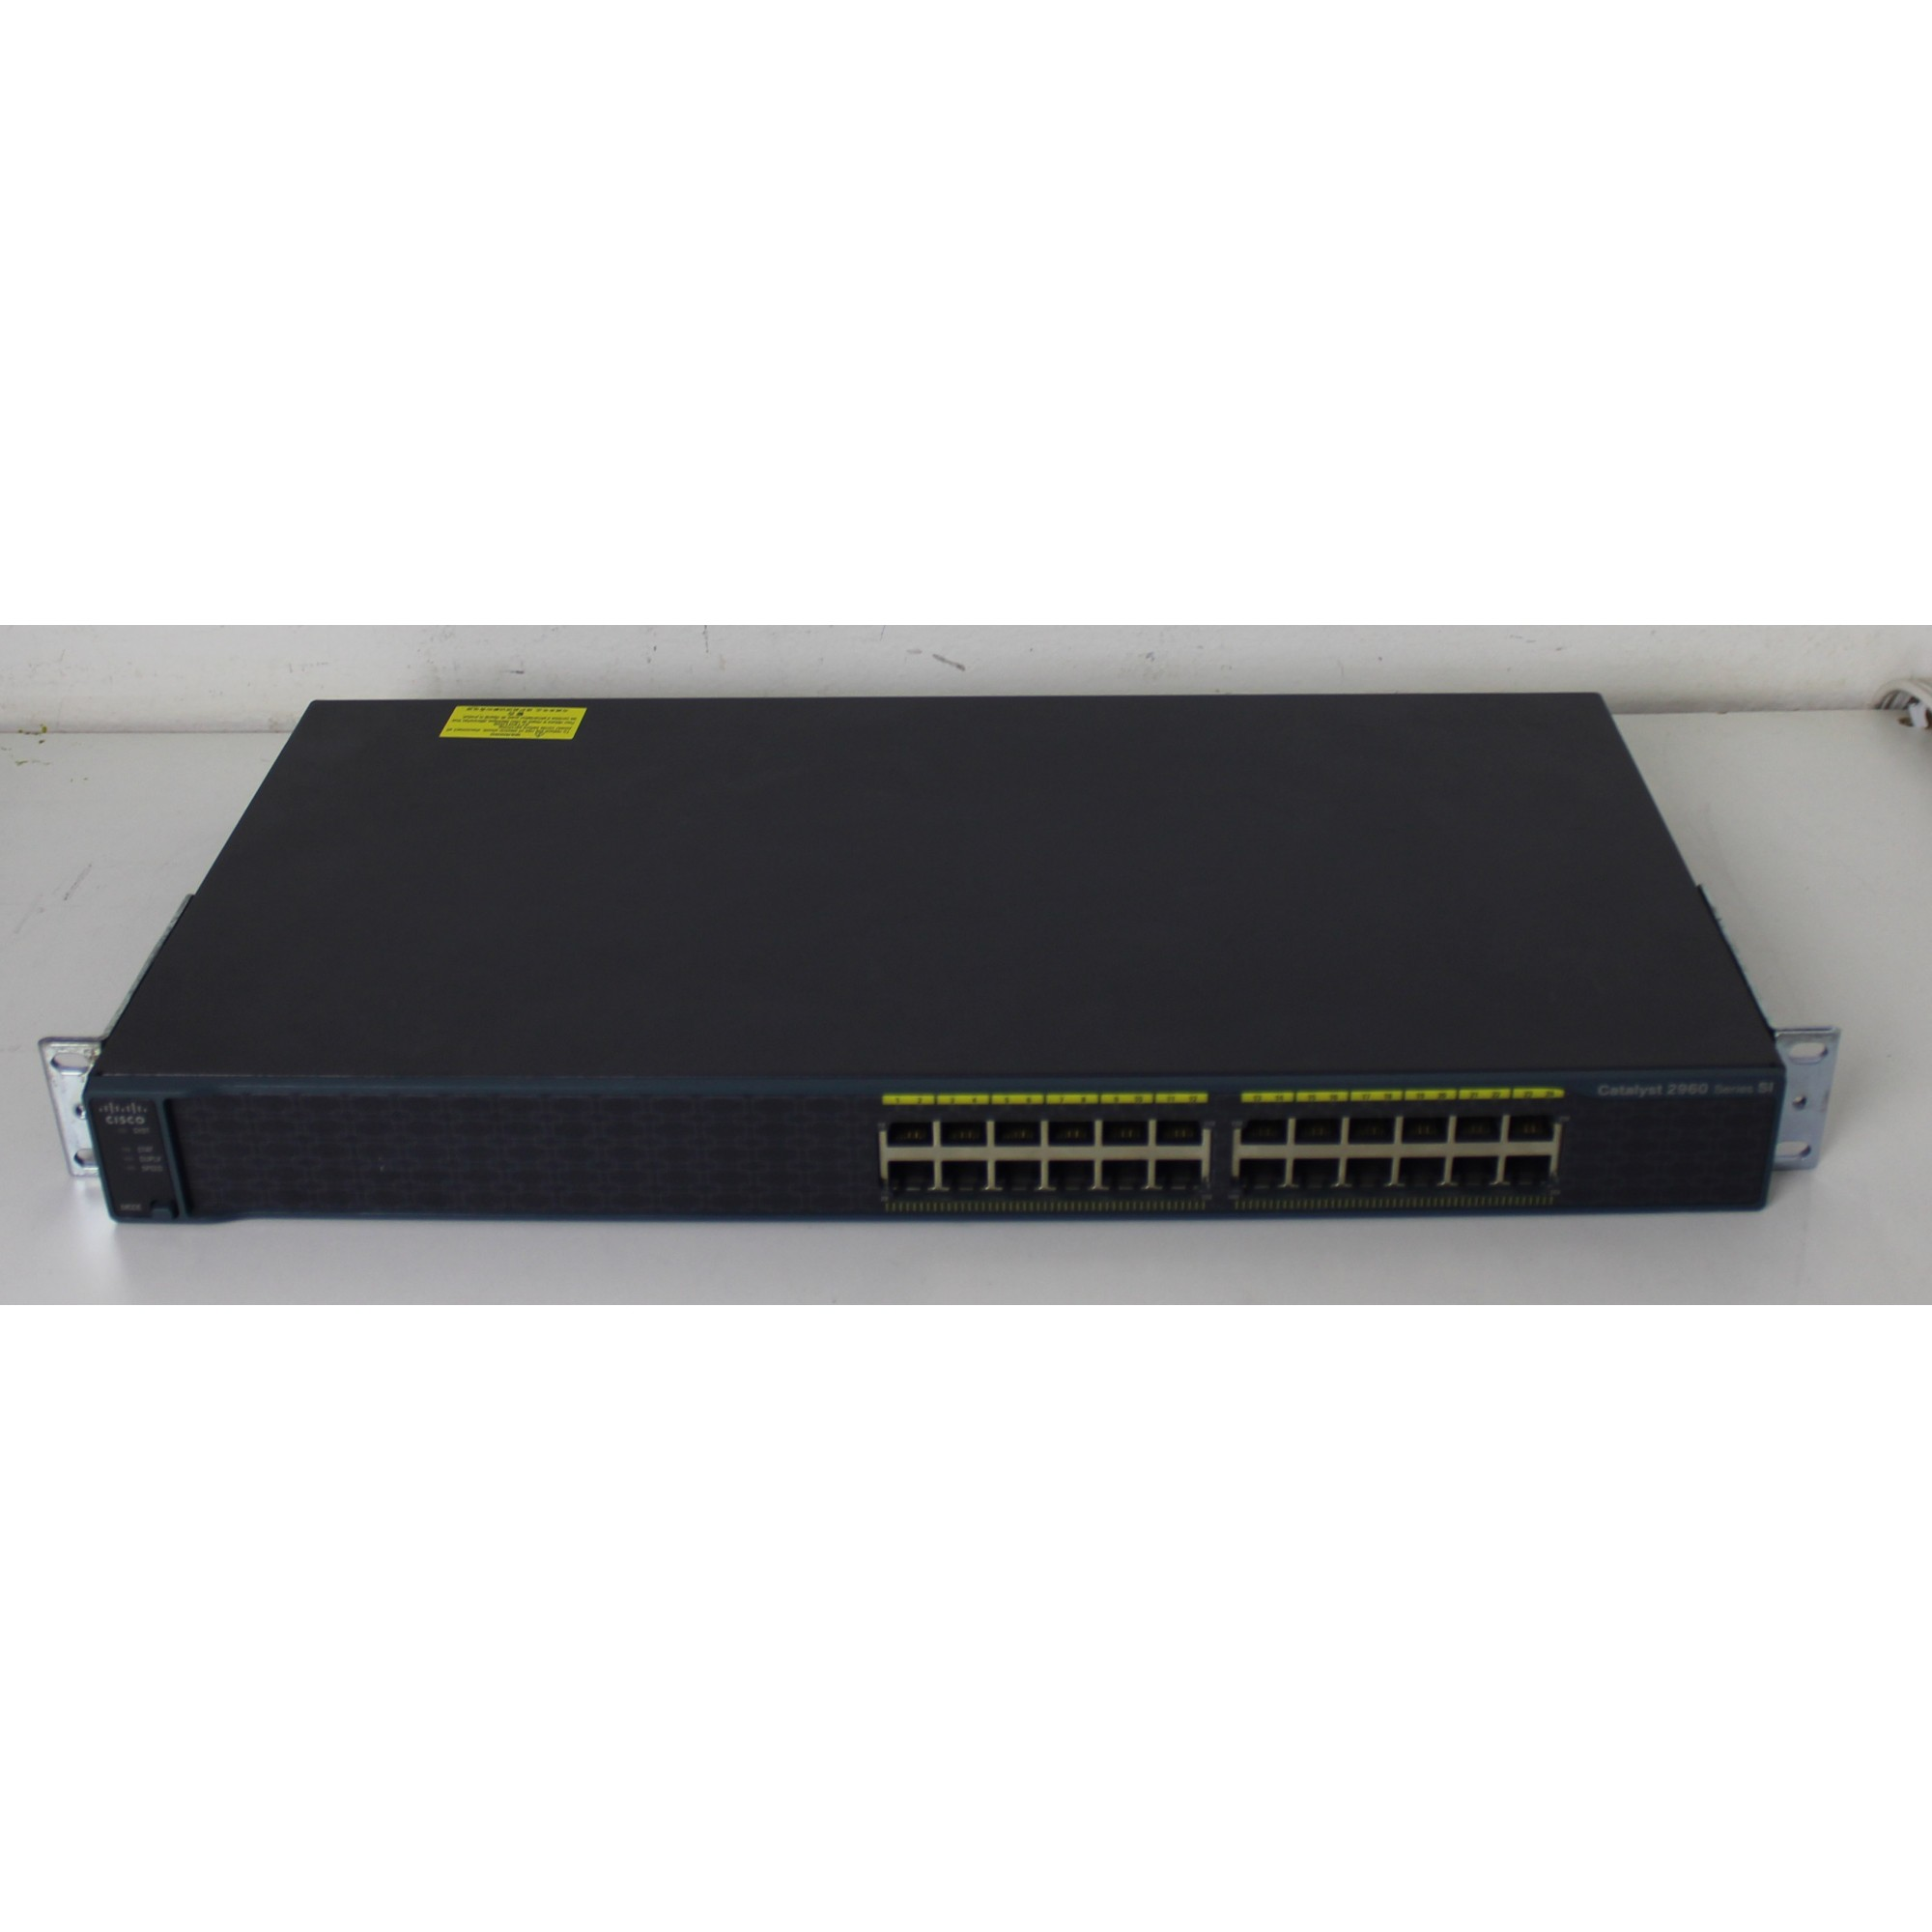 Switch Cisco Catalyst 2960 Series Si PoE-24